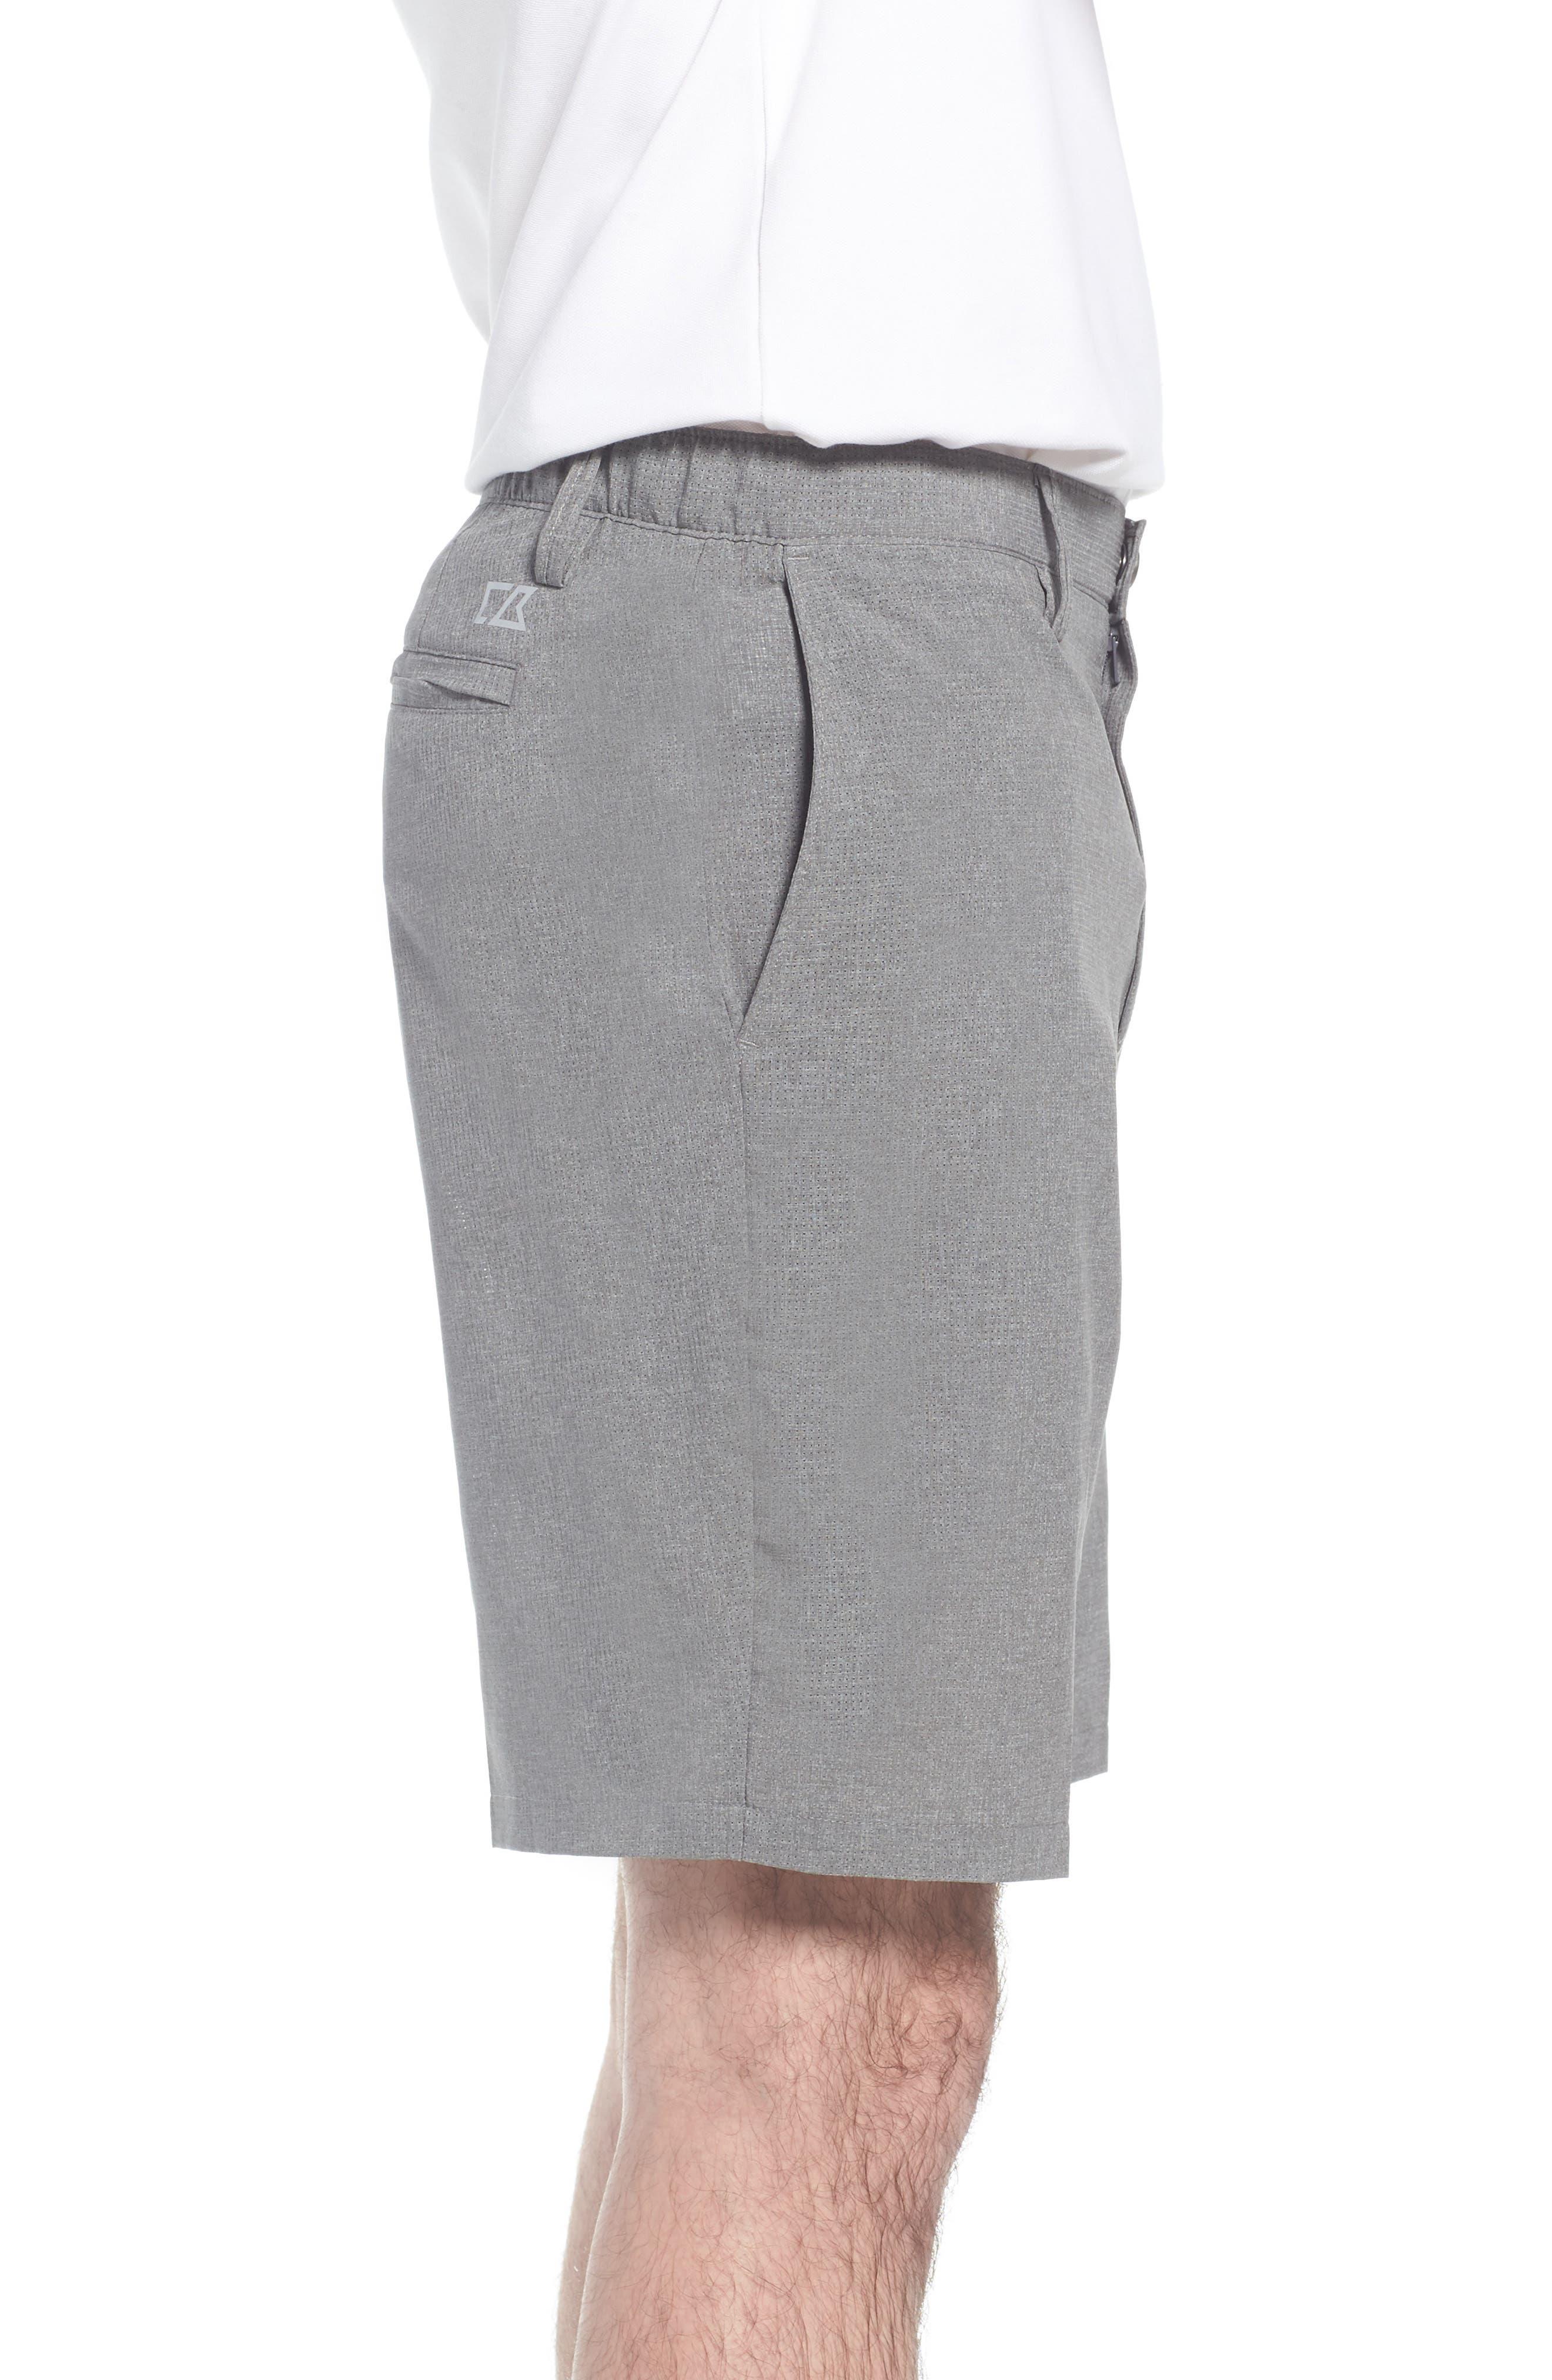 Windsor Active Classic Fit Shorts,                             Alternate thumbnail 3, color,                             GRAVEL